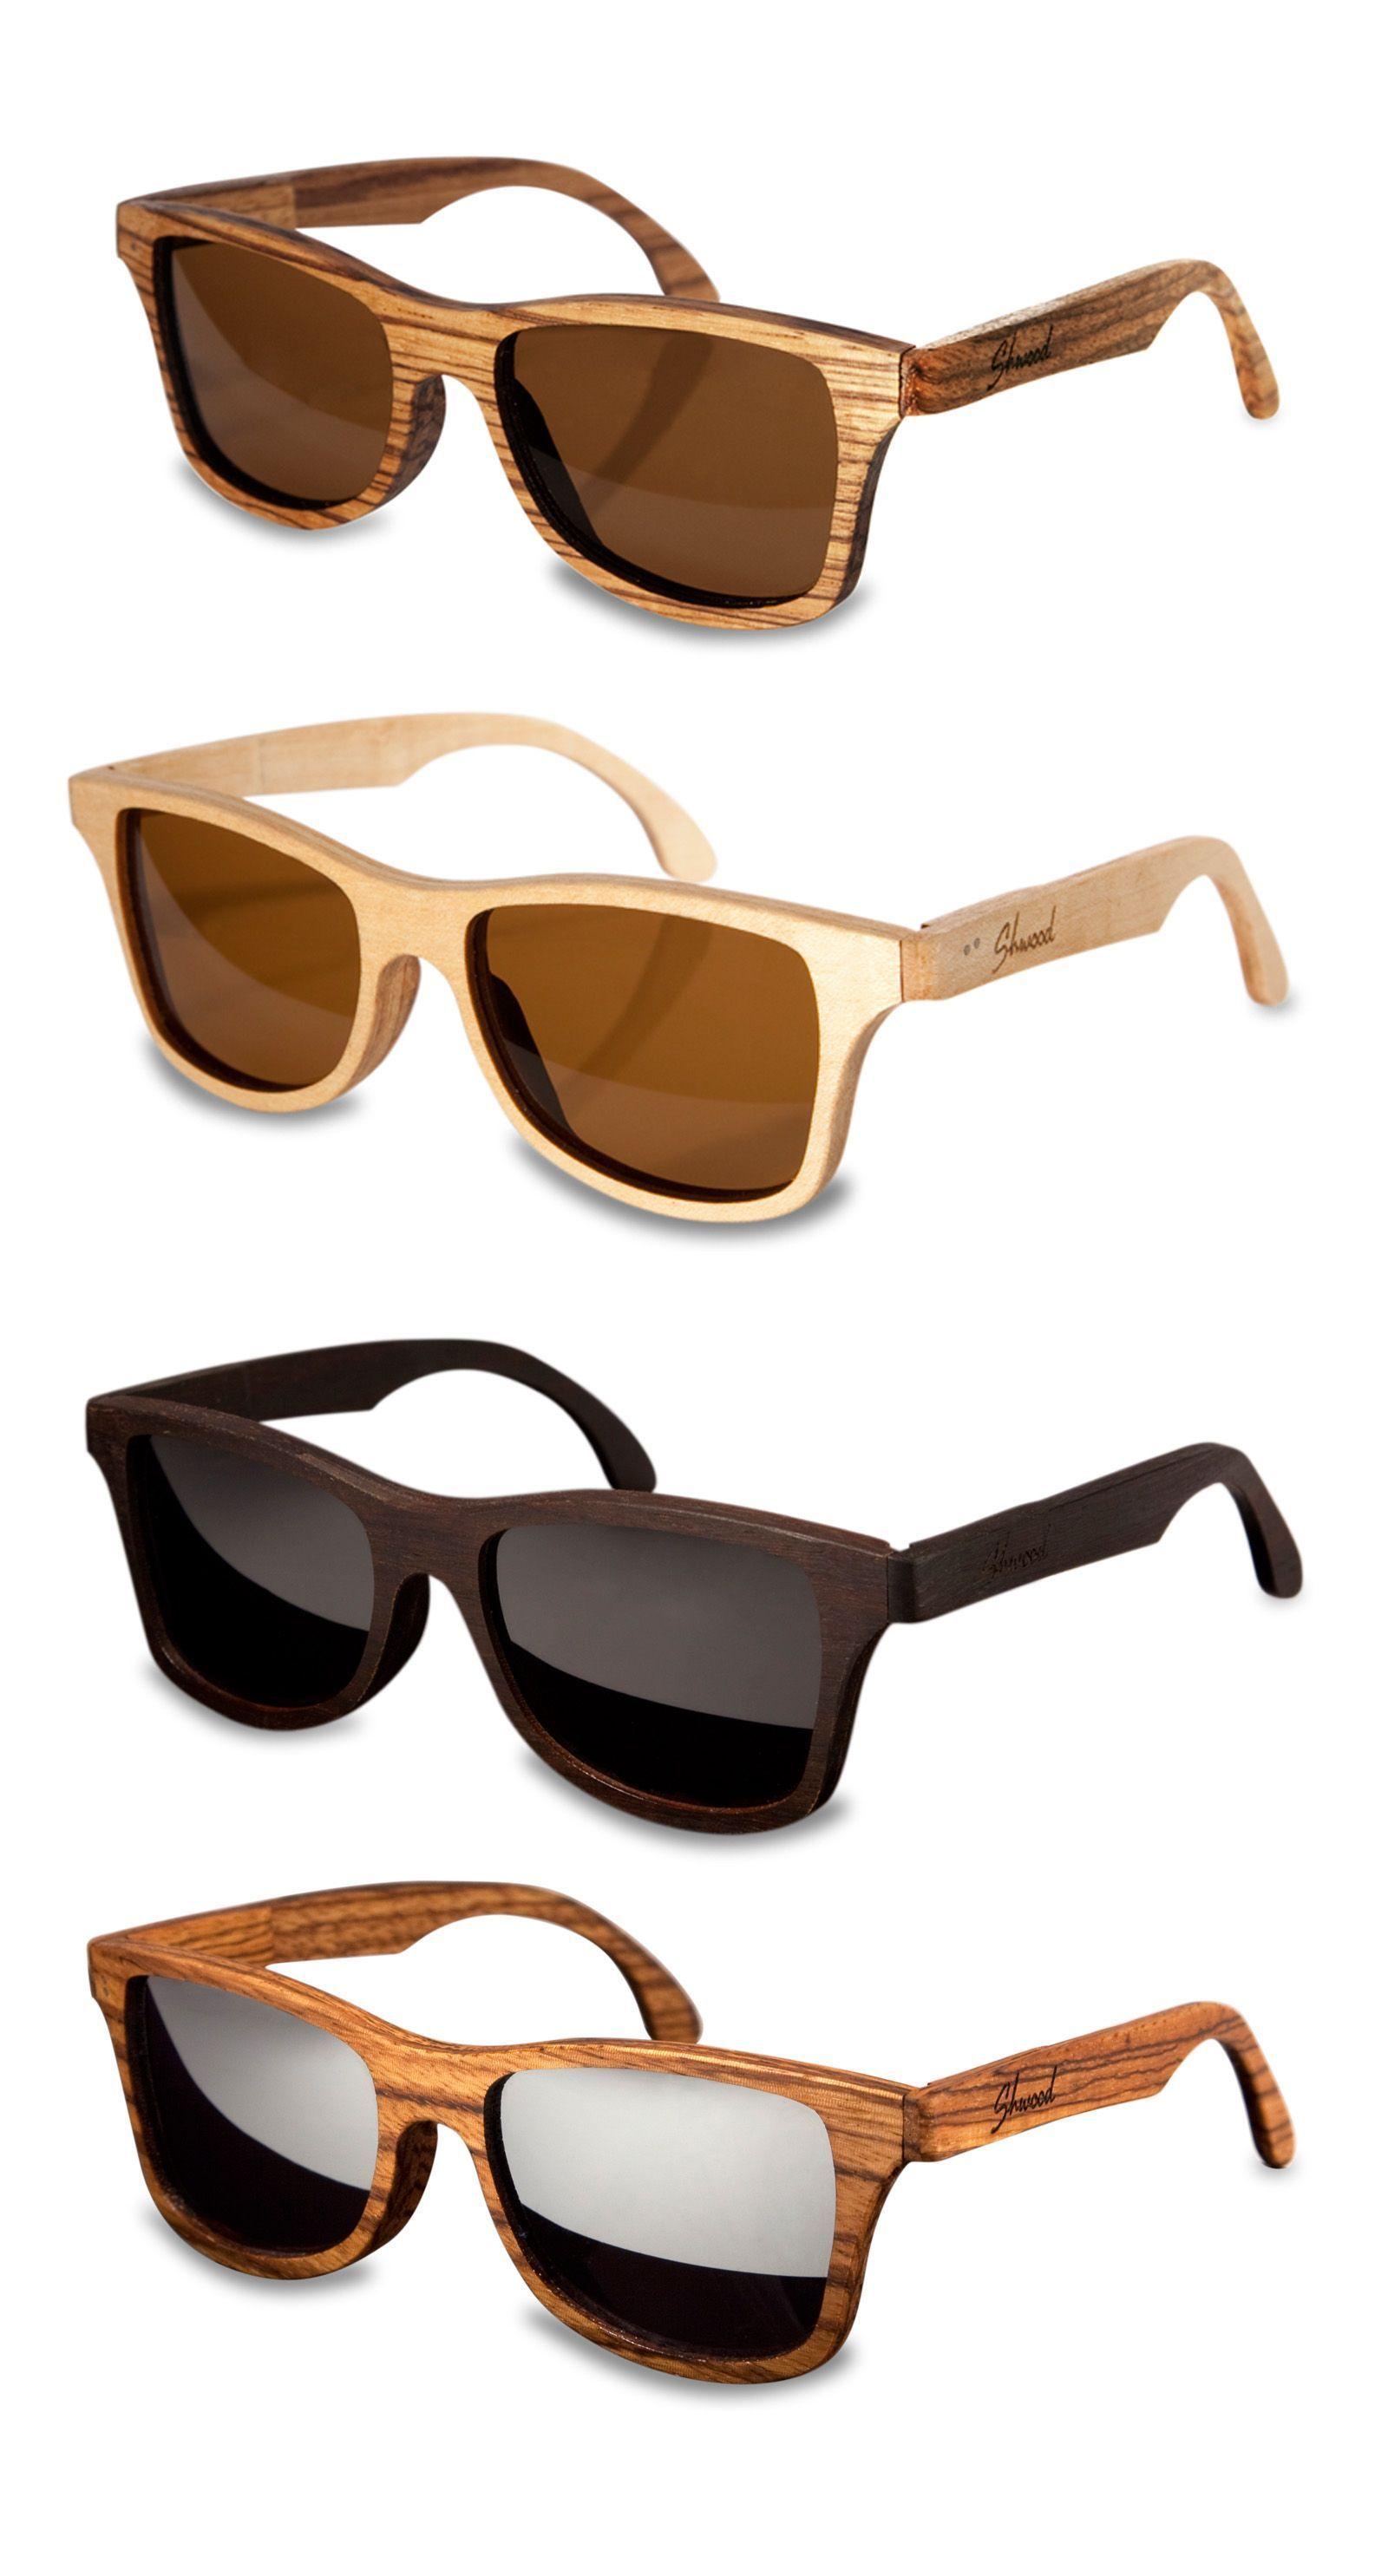 17516bc2e7 Wood Sunglasses. Wood Sunglasses Wooden Sunglasses